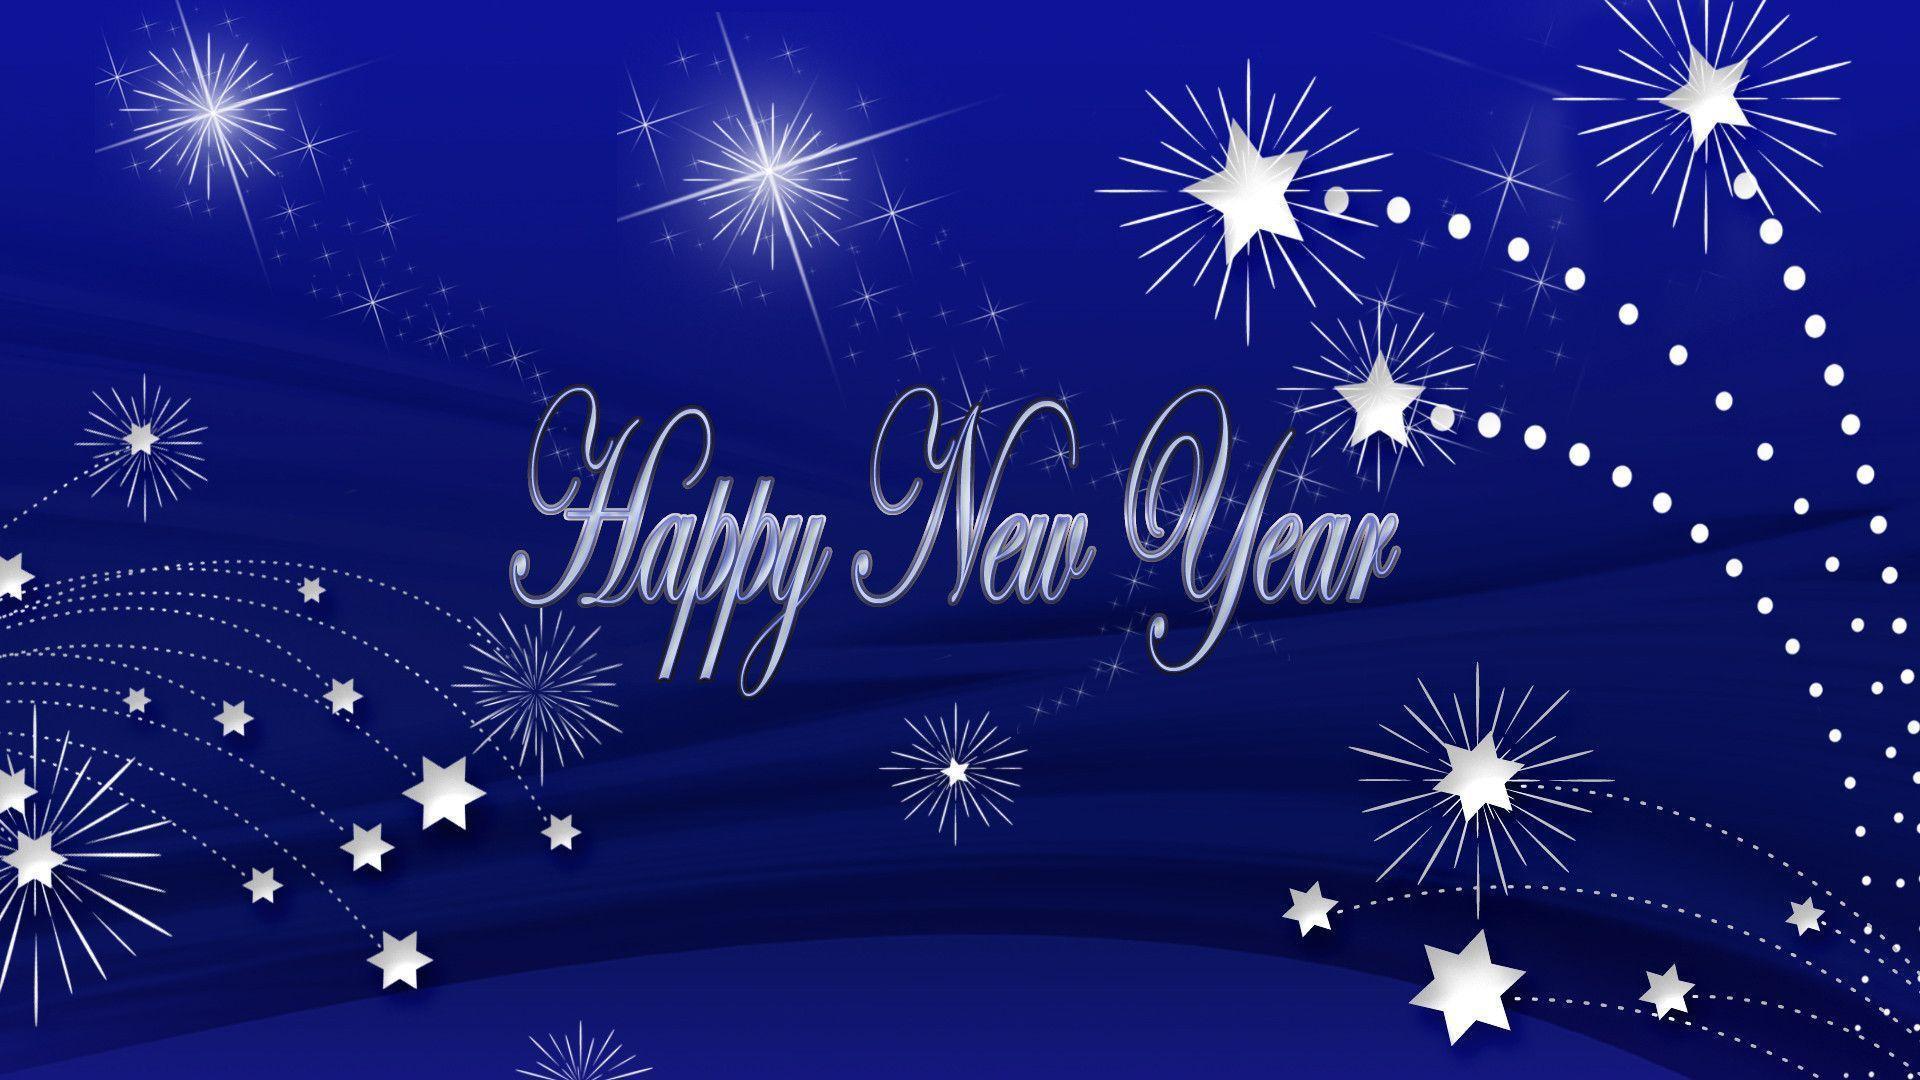 Happy New Year 2011 by Frankief on DeviantArt